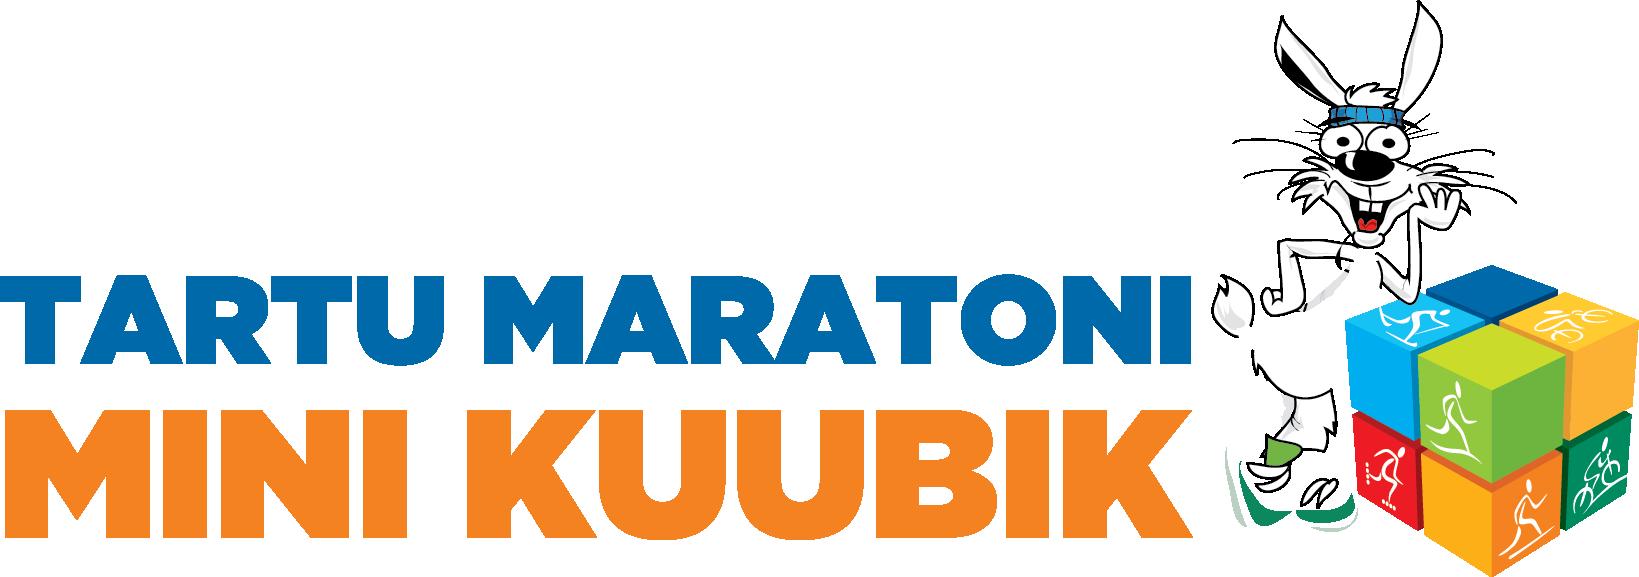 Tartu maraton kuubik